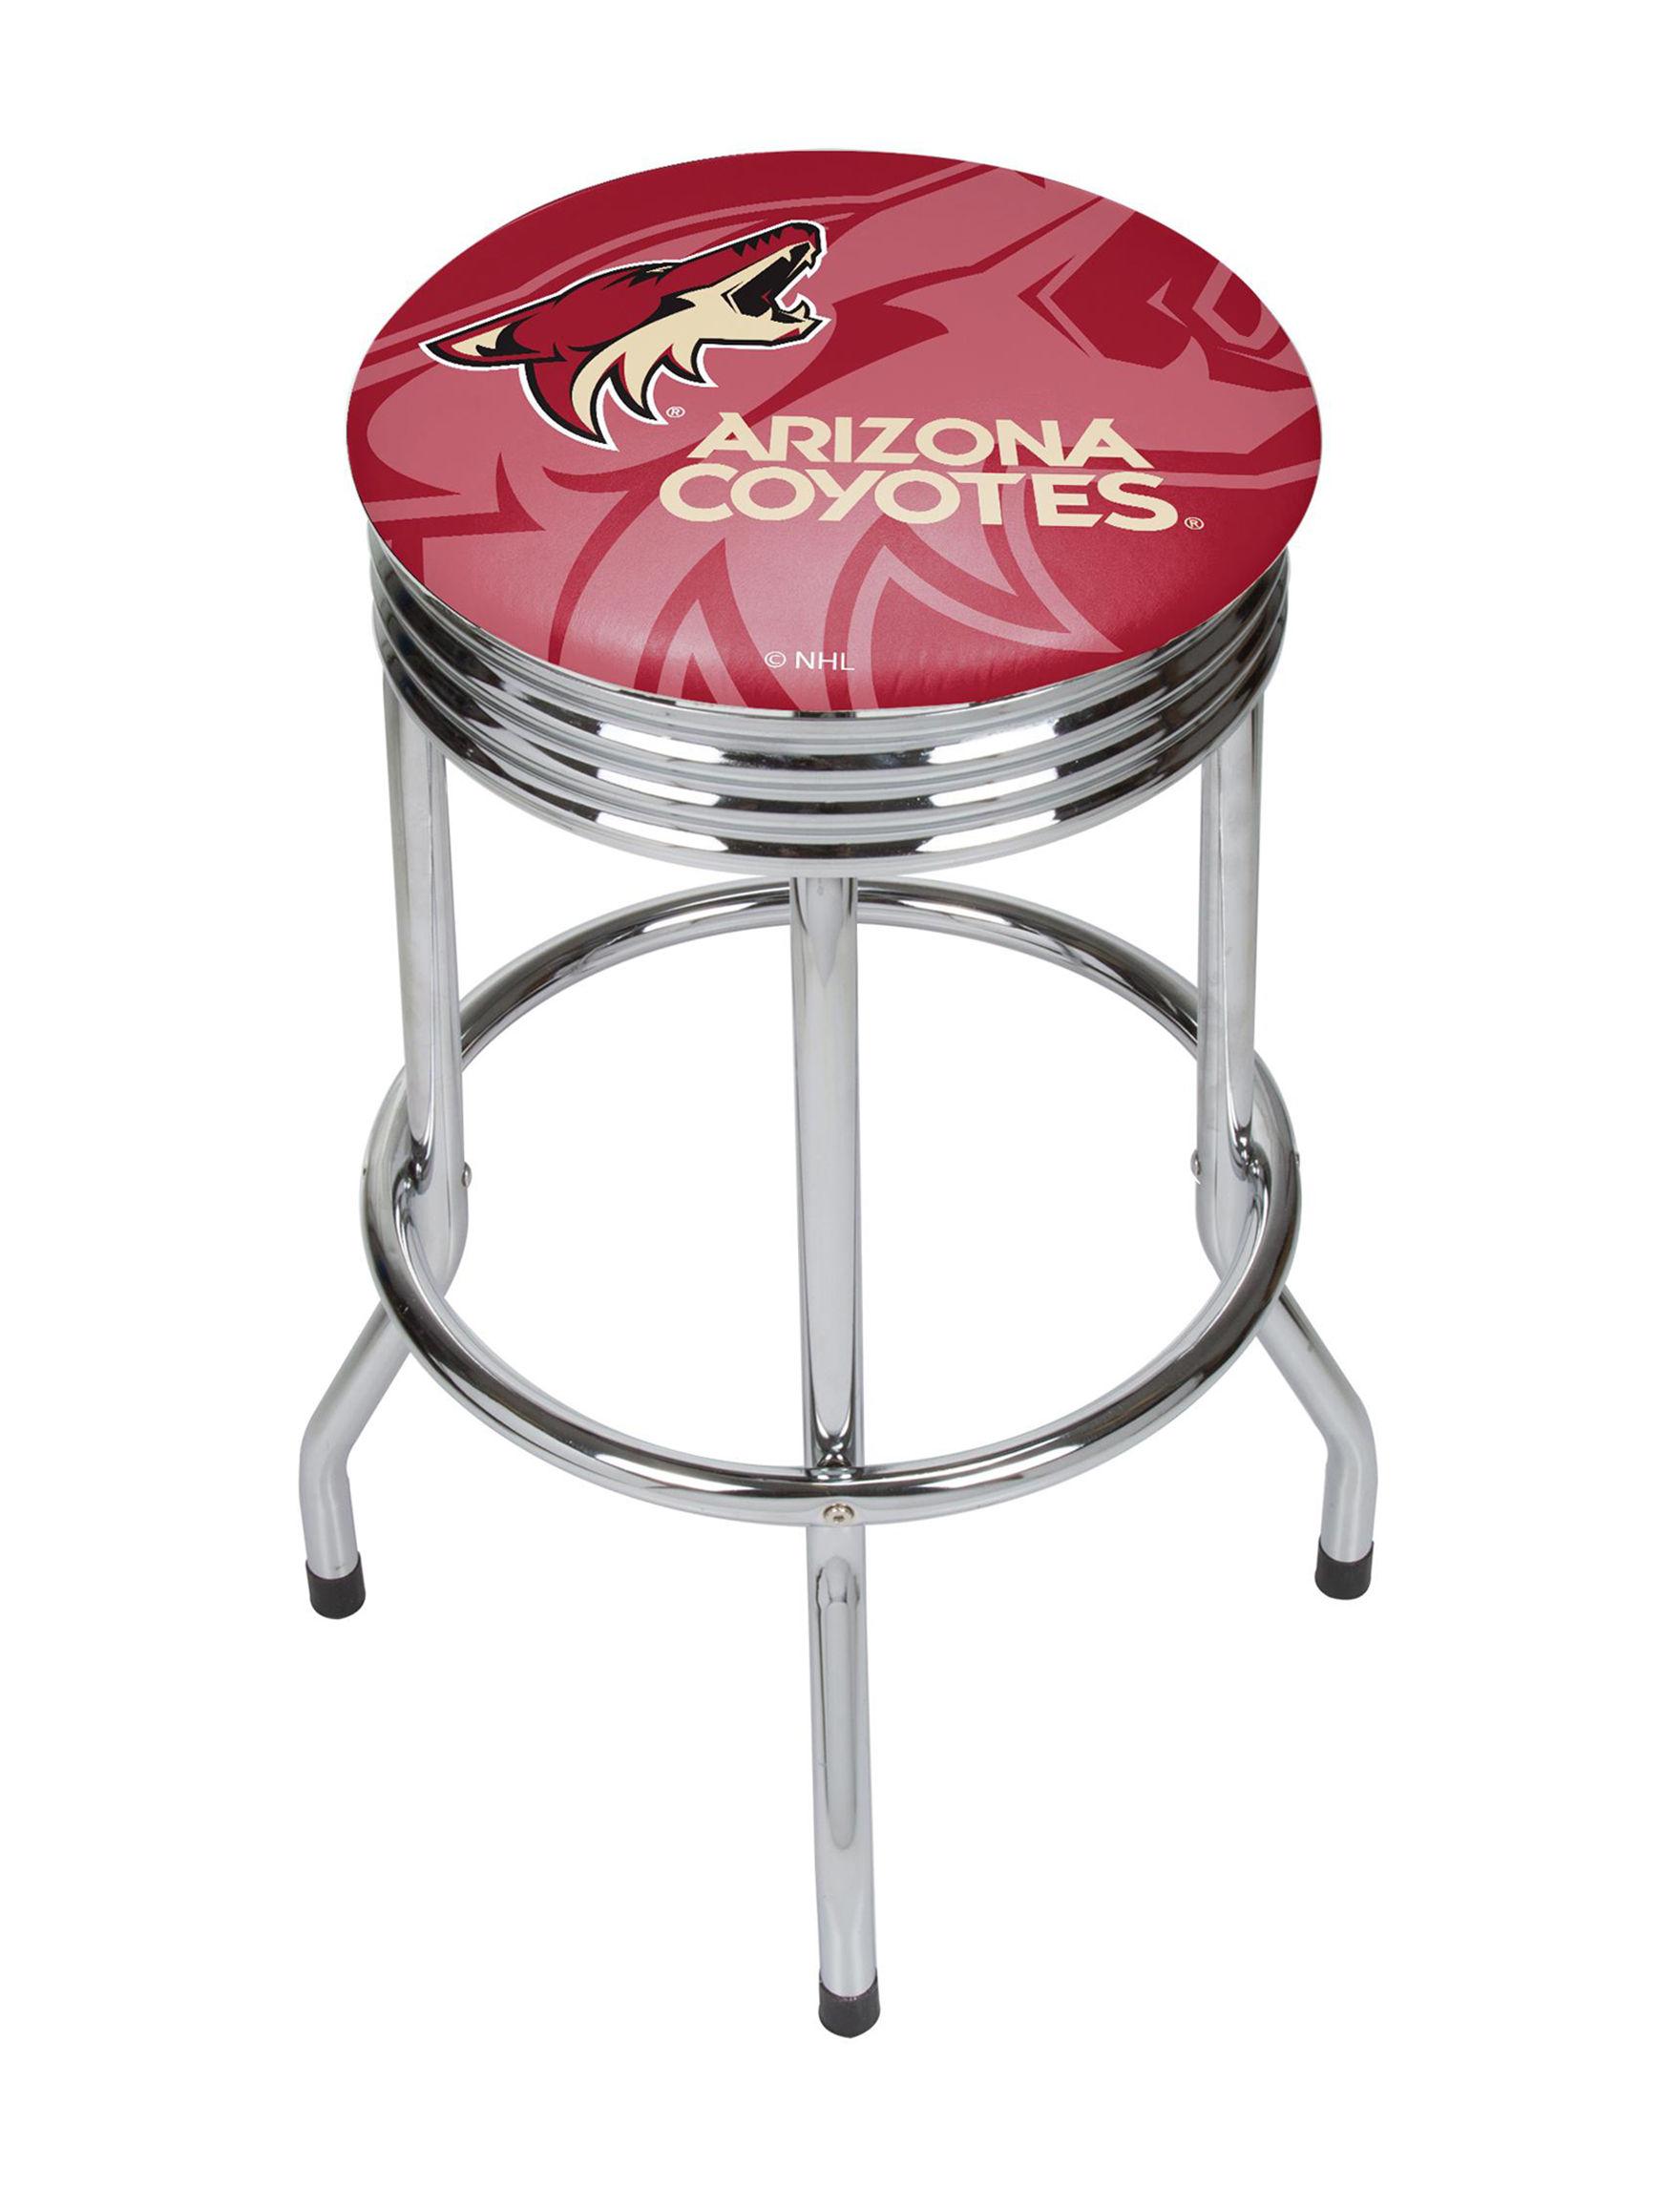 NHL Brick Red Bar & Kitchen Stools Kitchen & Dining Furniture